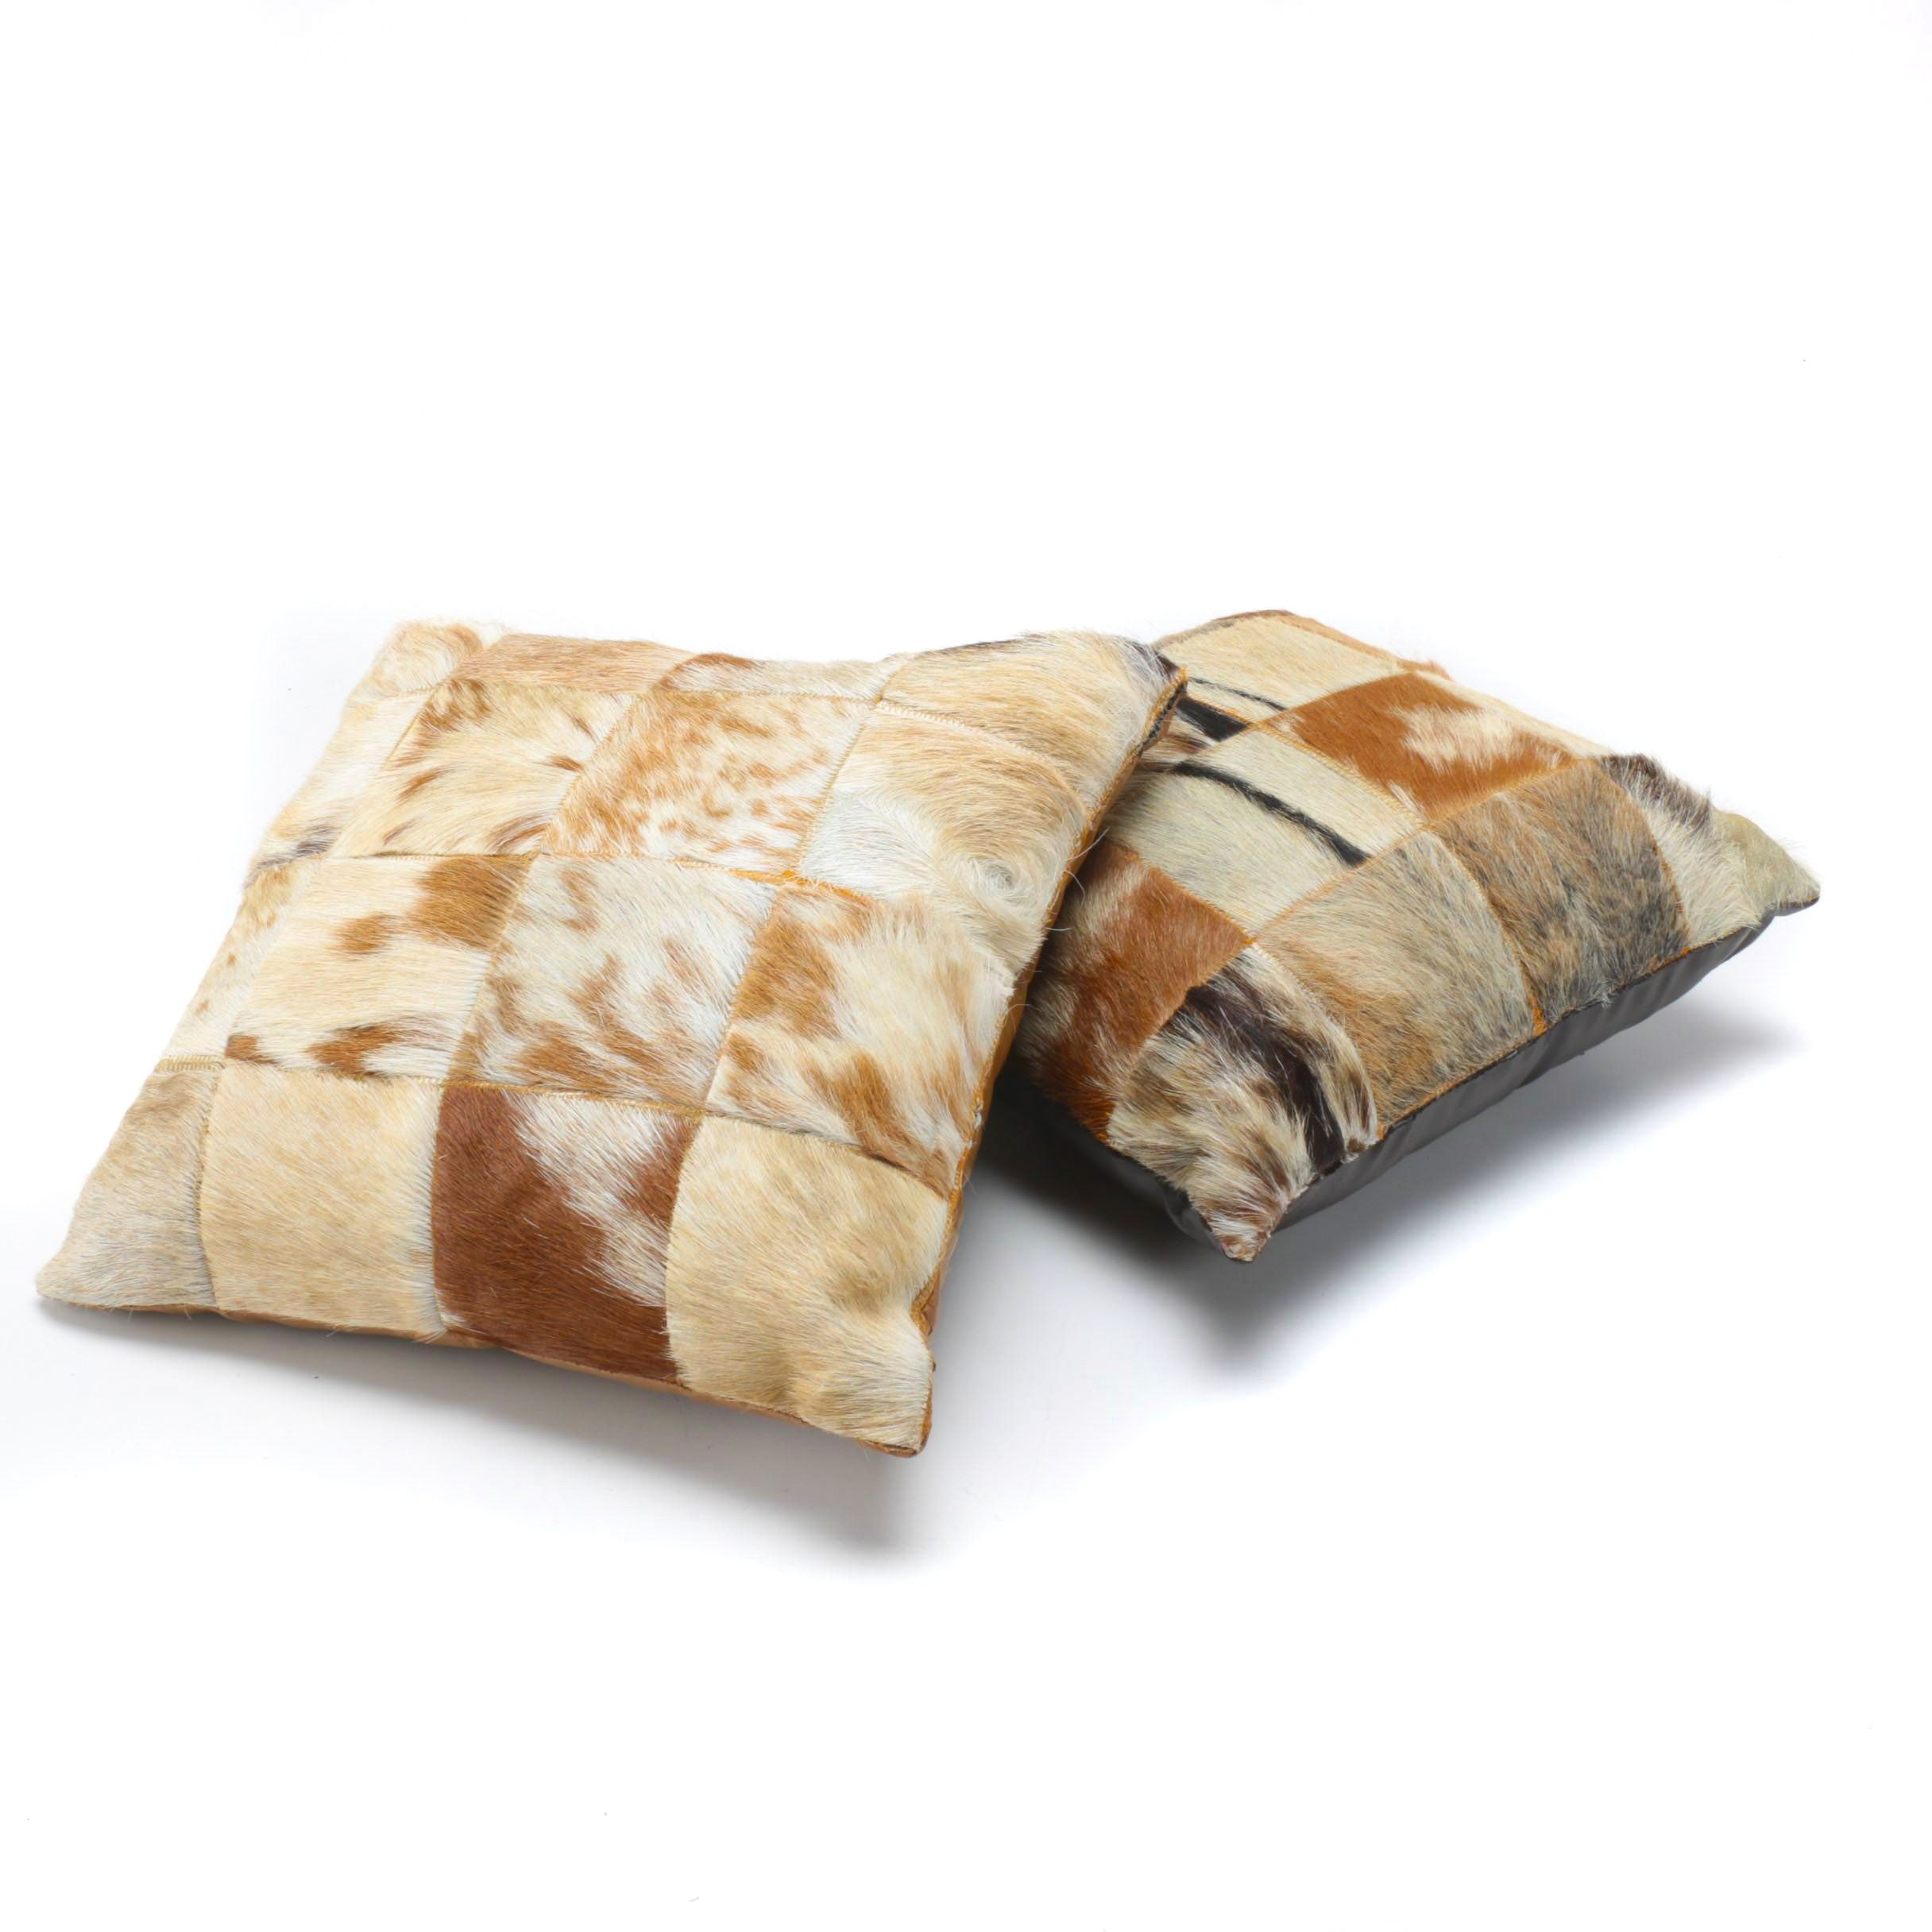 Pair of Cow Motif Pillows